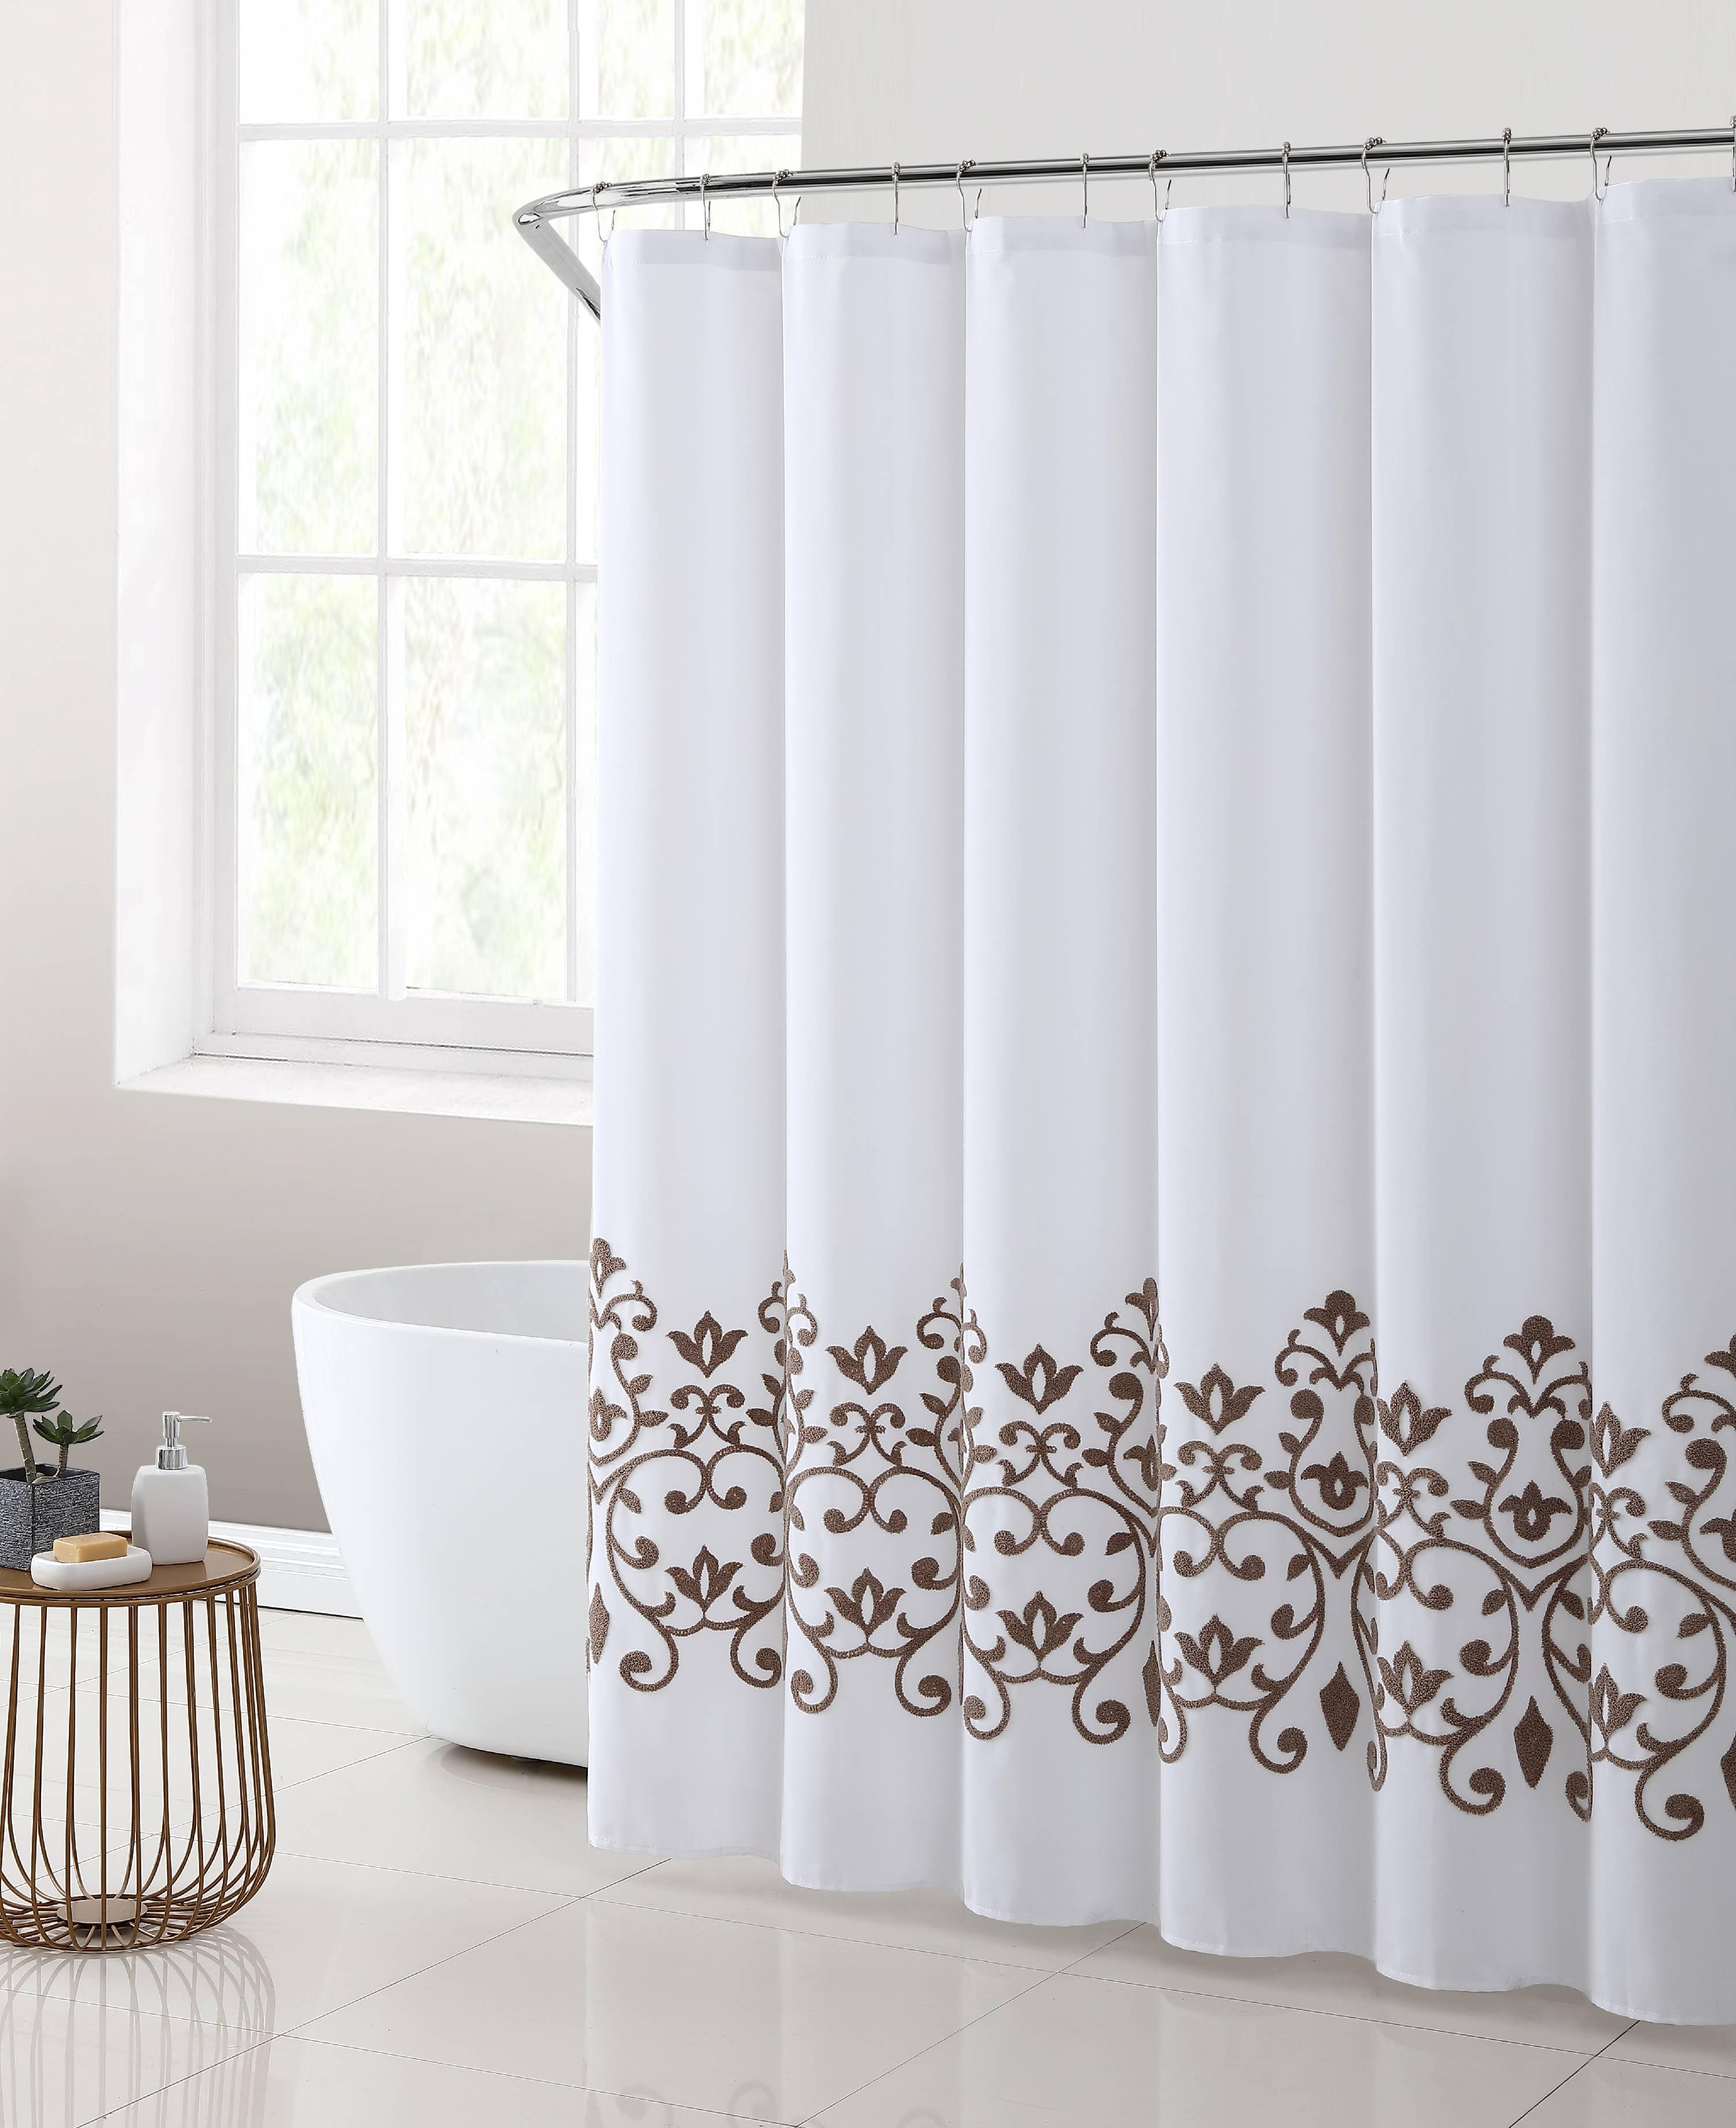 better homes & gardens montauk embroidered shower curtain